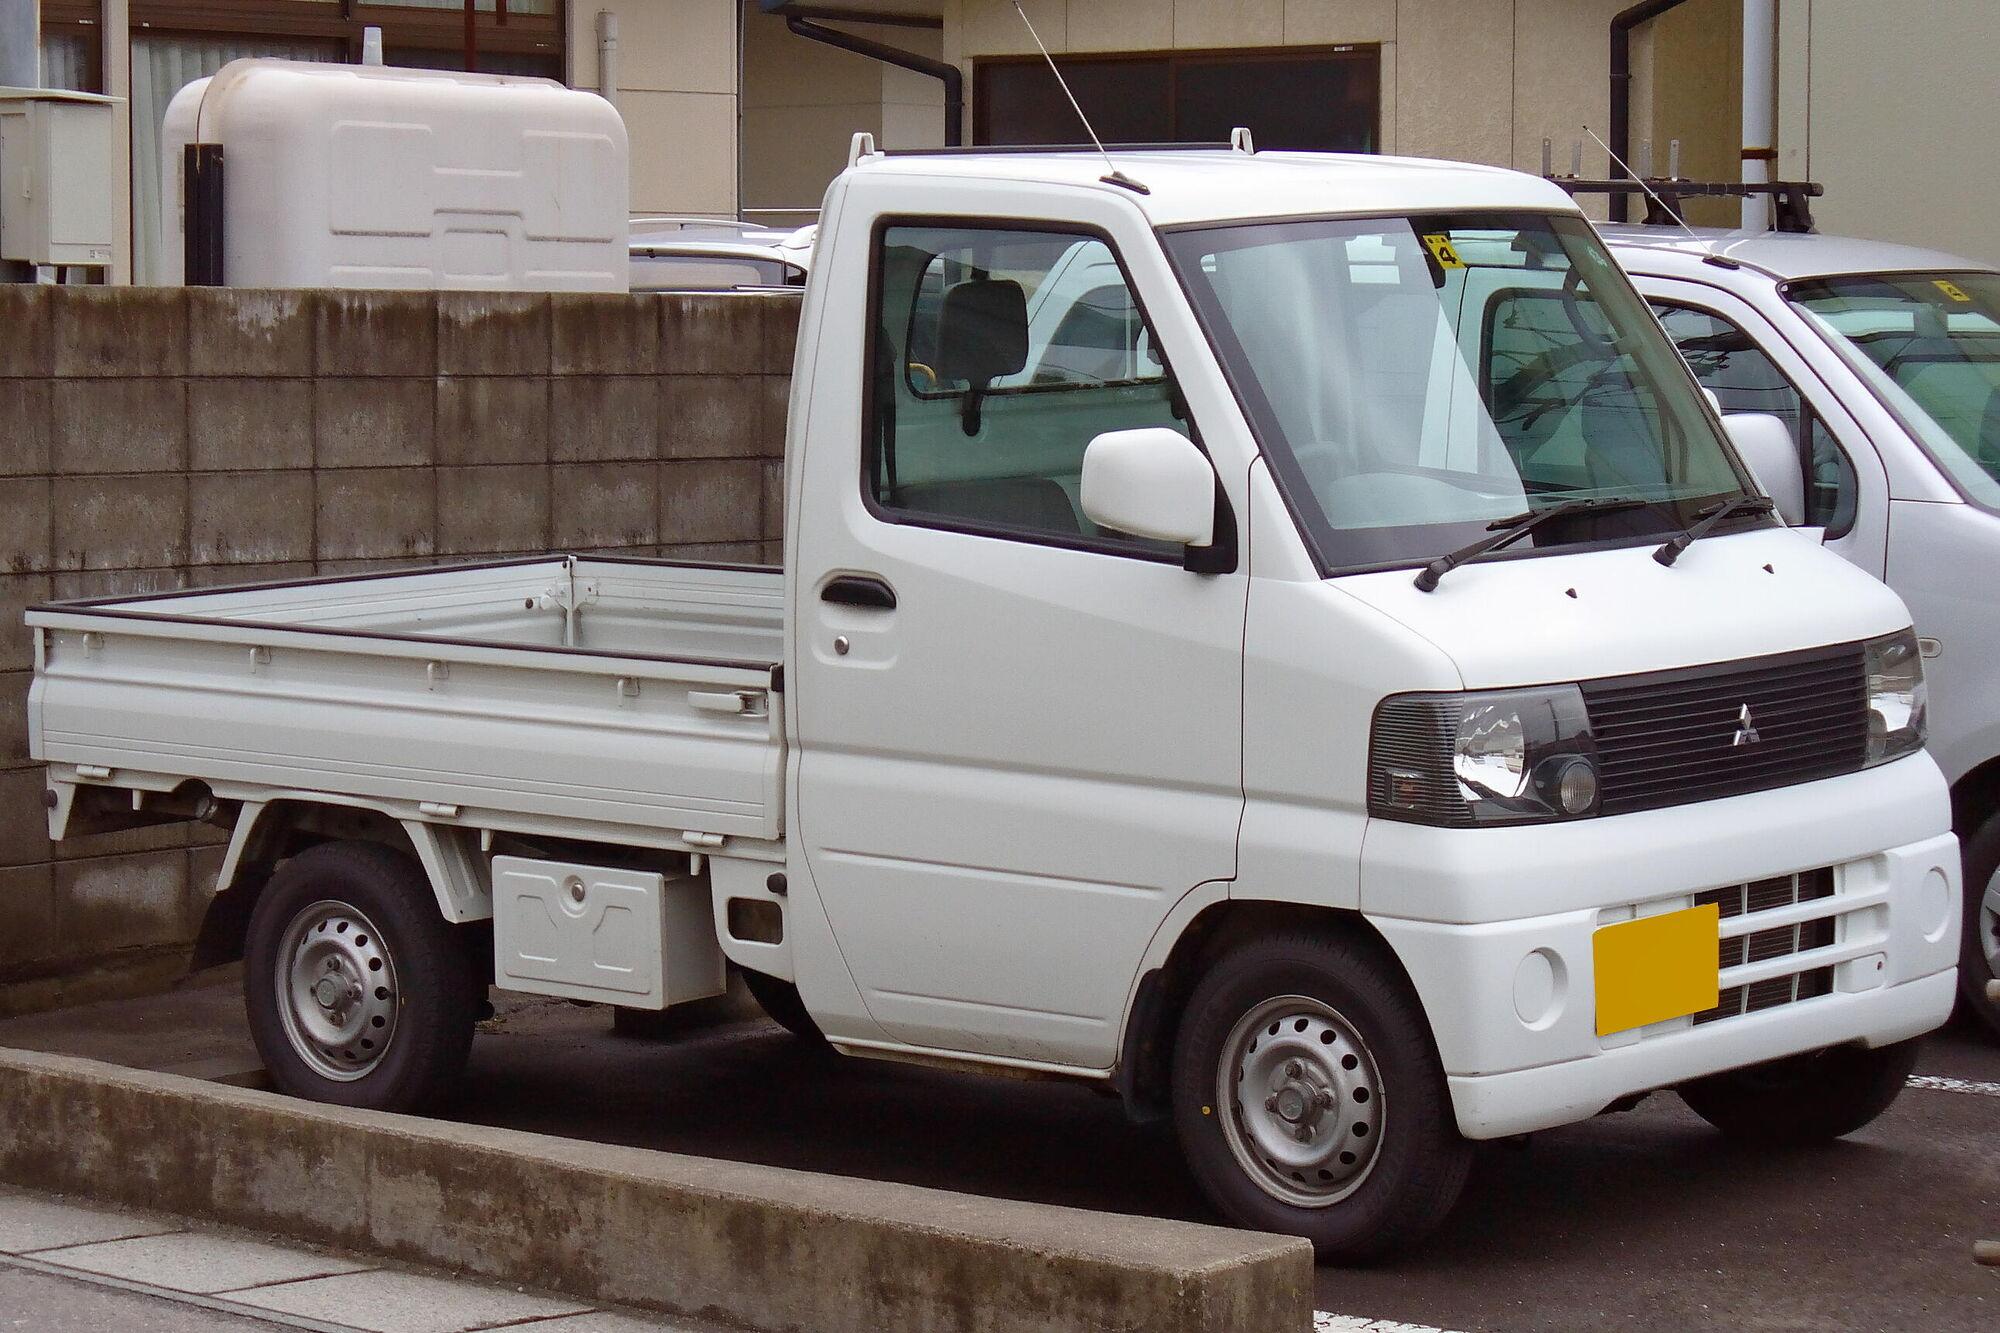 series max pickup ab of earey pick autonews the mitsubishi trucks defines all generation new next